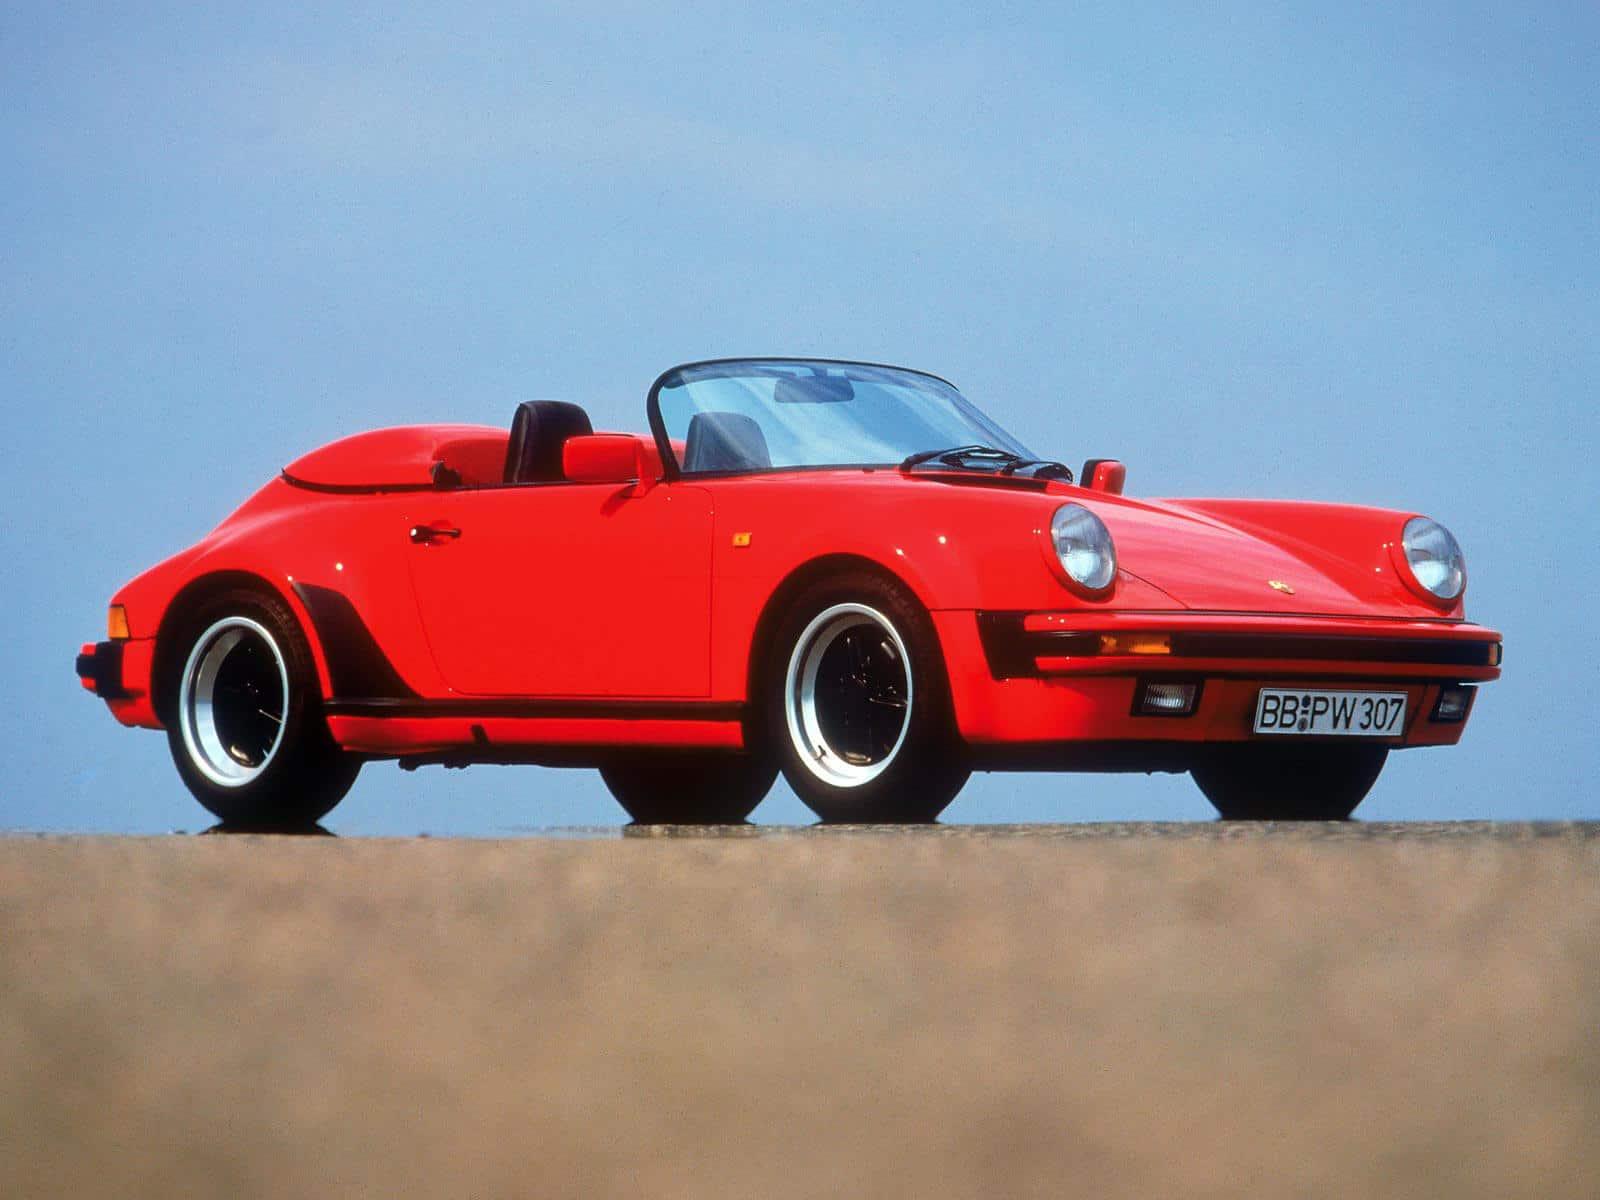 Porsche 911 Speedster Turbo-Look 1989 vue AV - photo Porsche